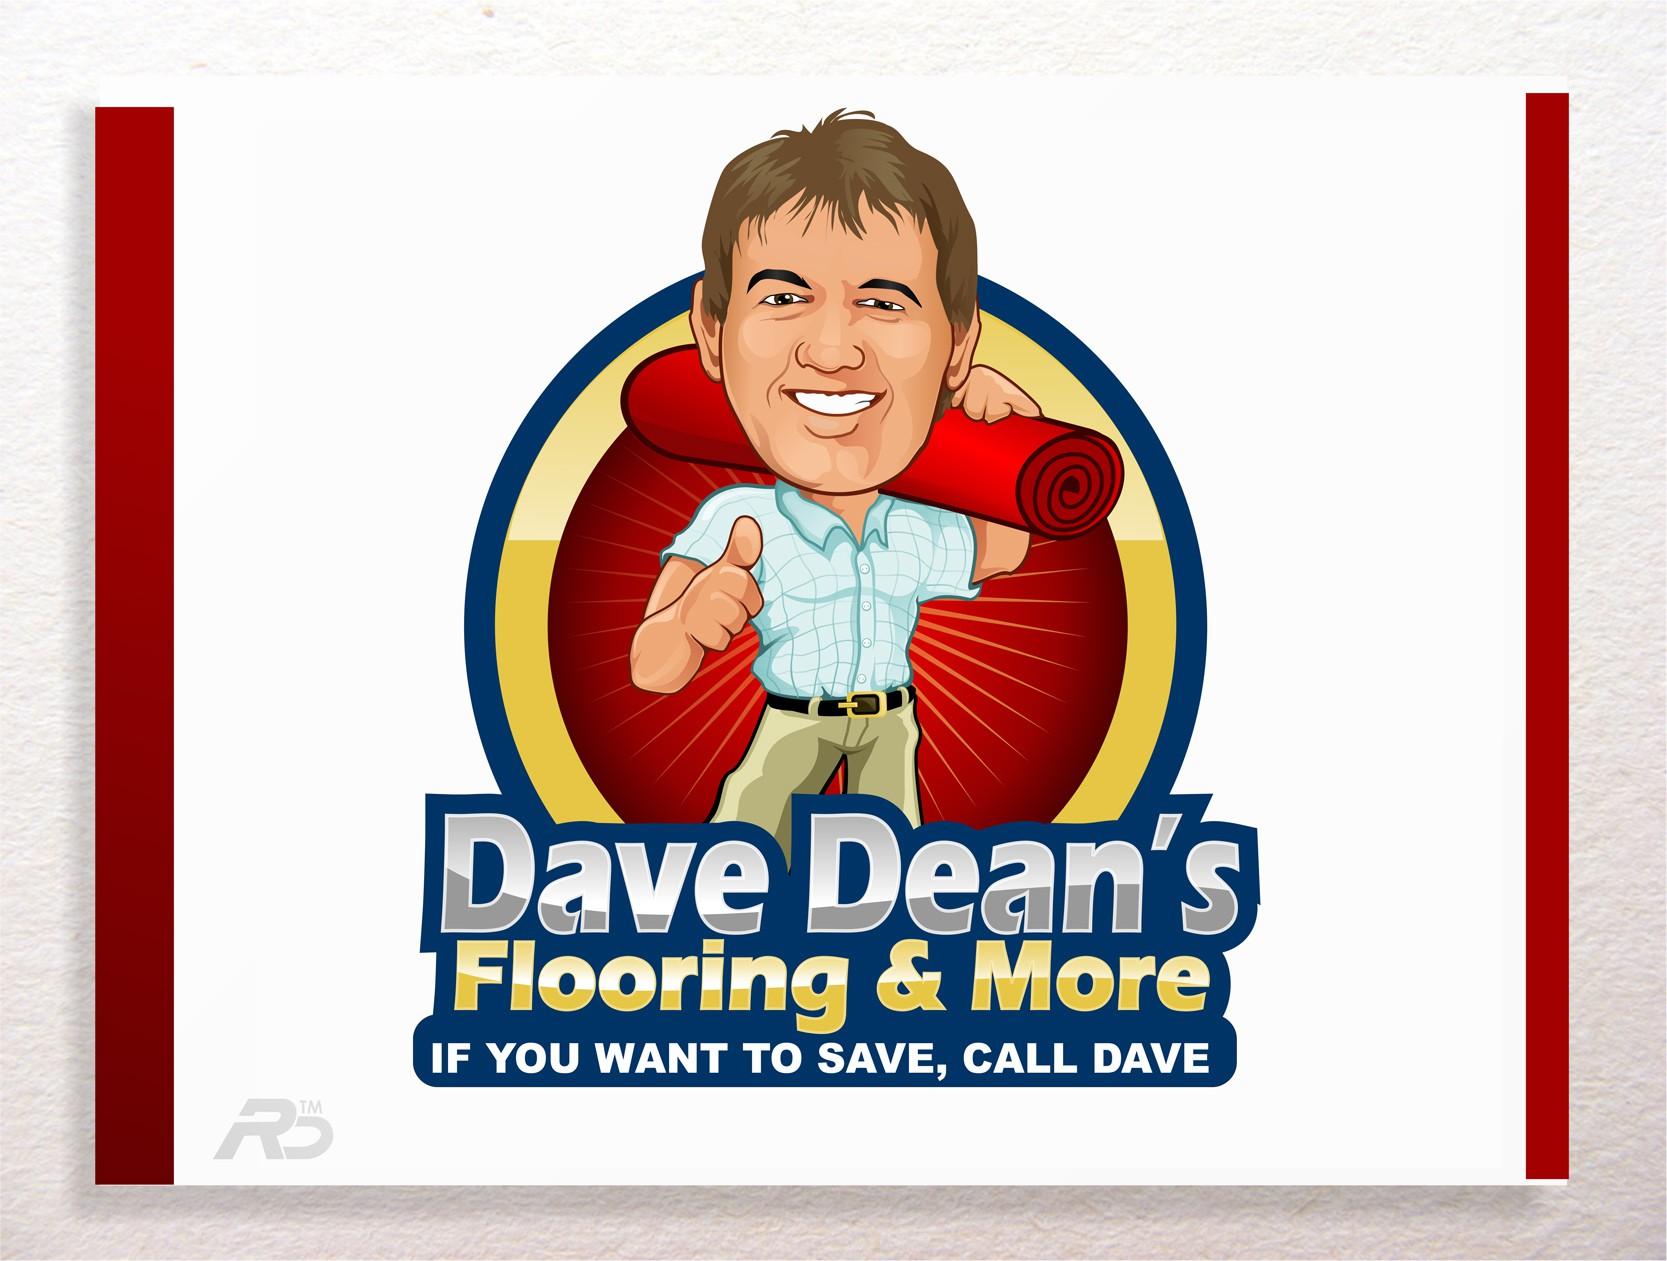 logo for Dave Dean's Flooring & More